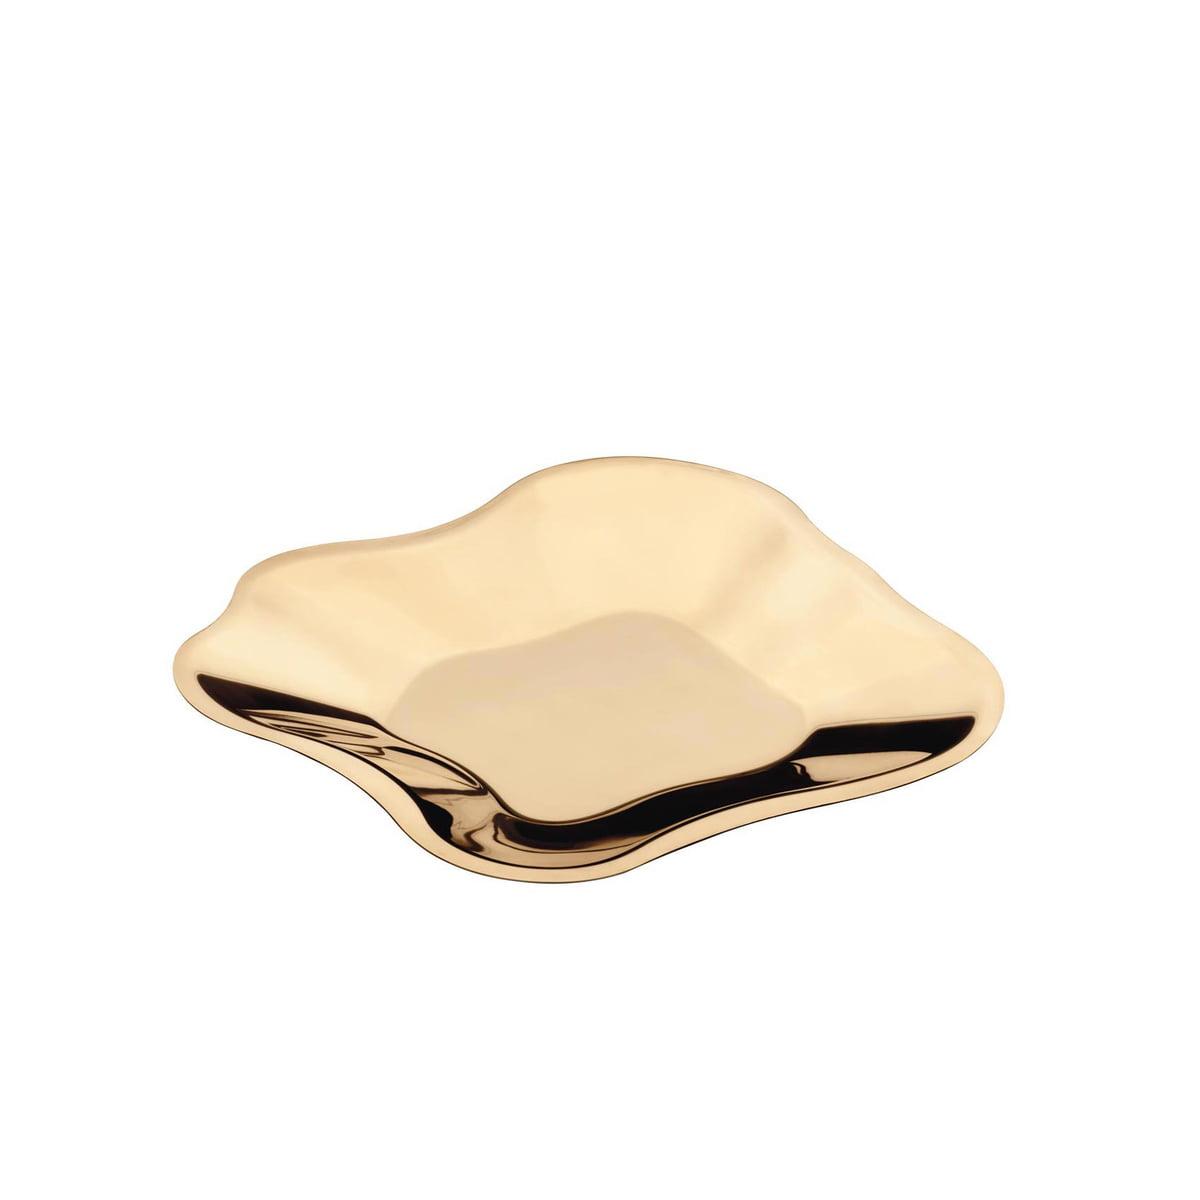 Iittala aalto schale flach rose gold 358 mm